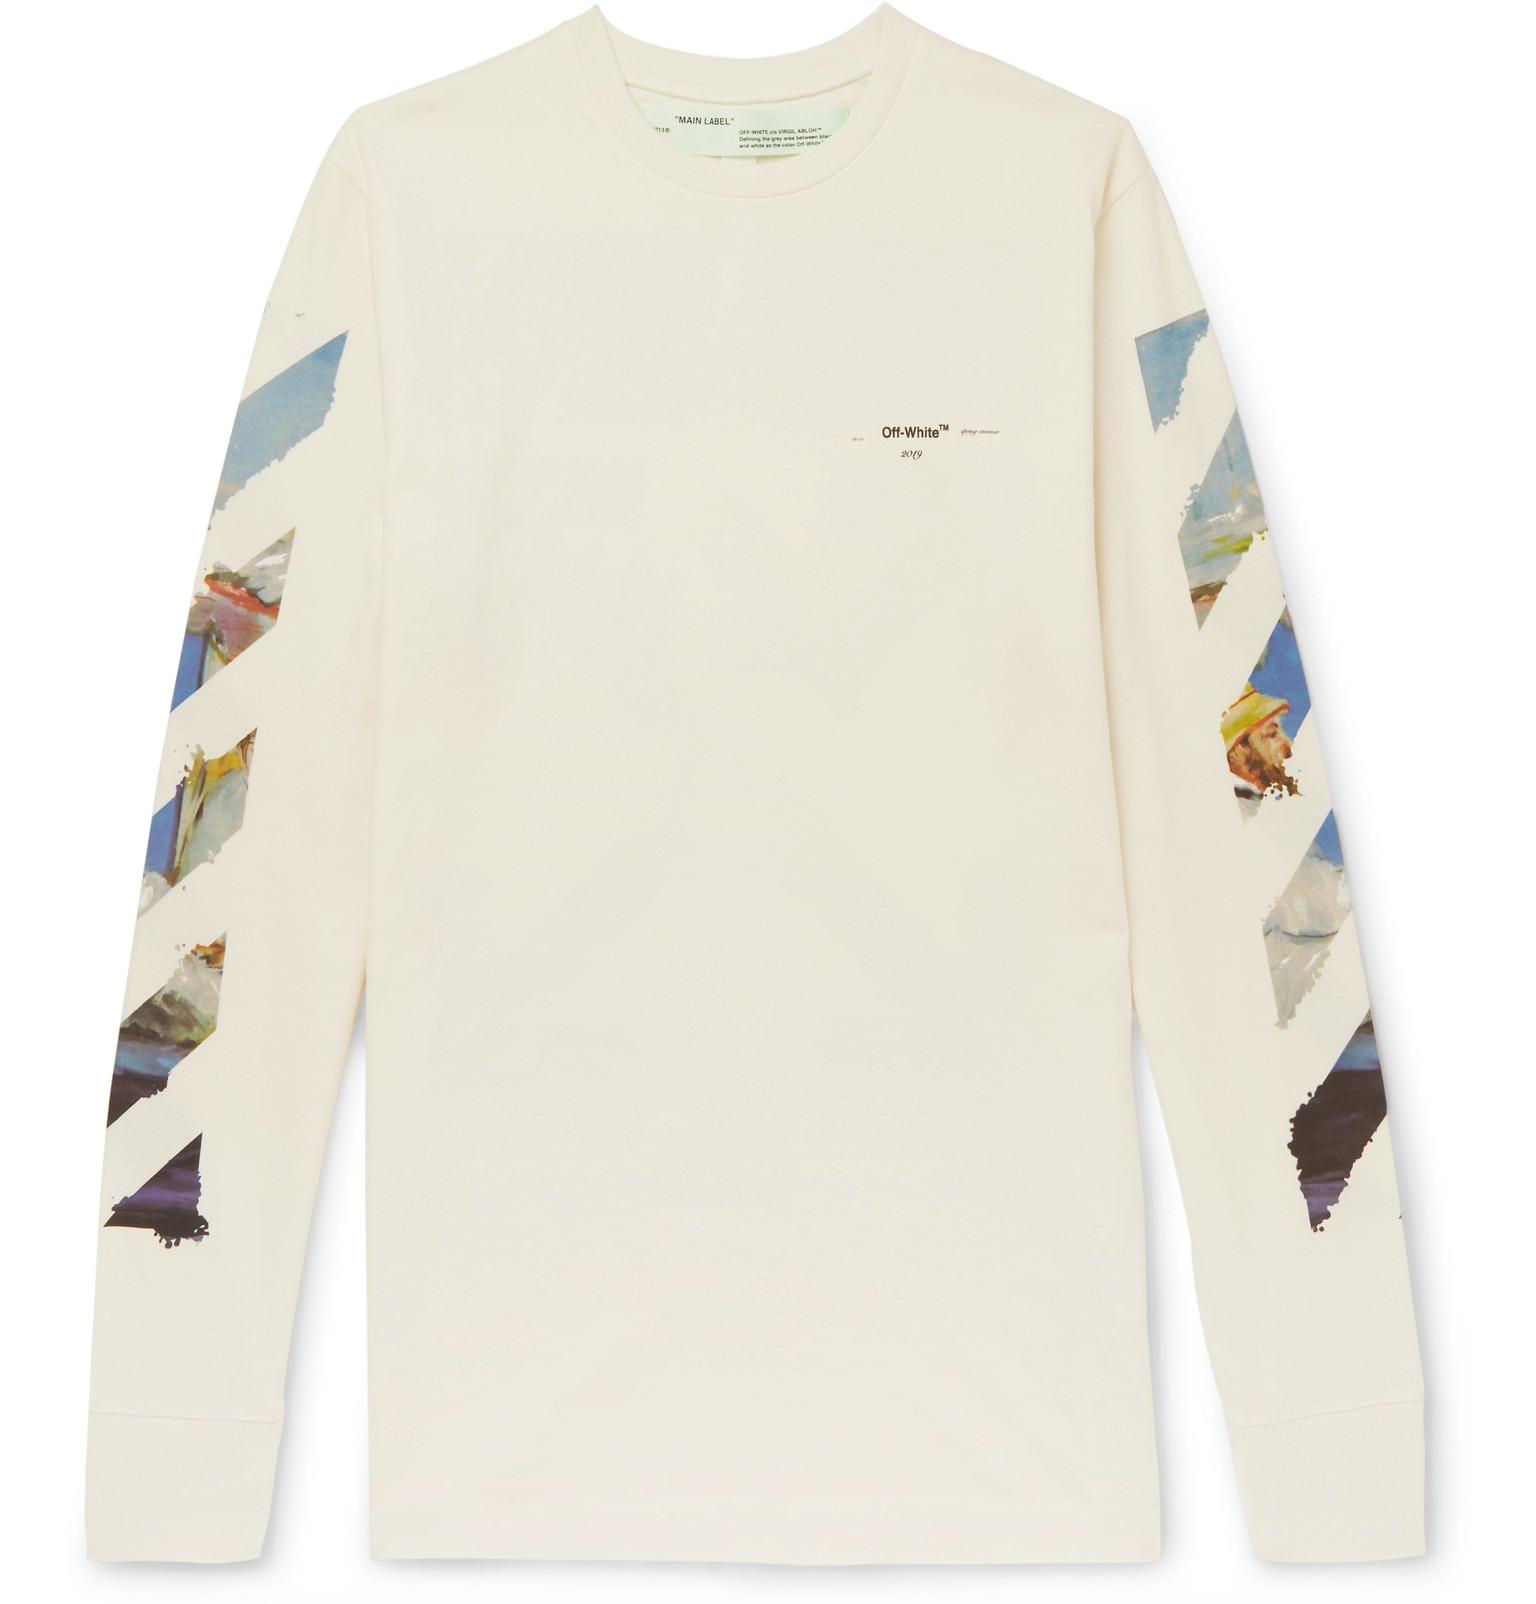 b32597f9f Off White Virgil Abloh Long Sleeve T Shirt - raveitsafe